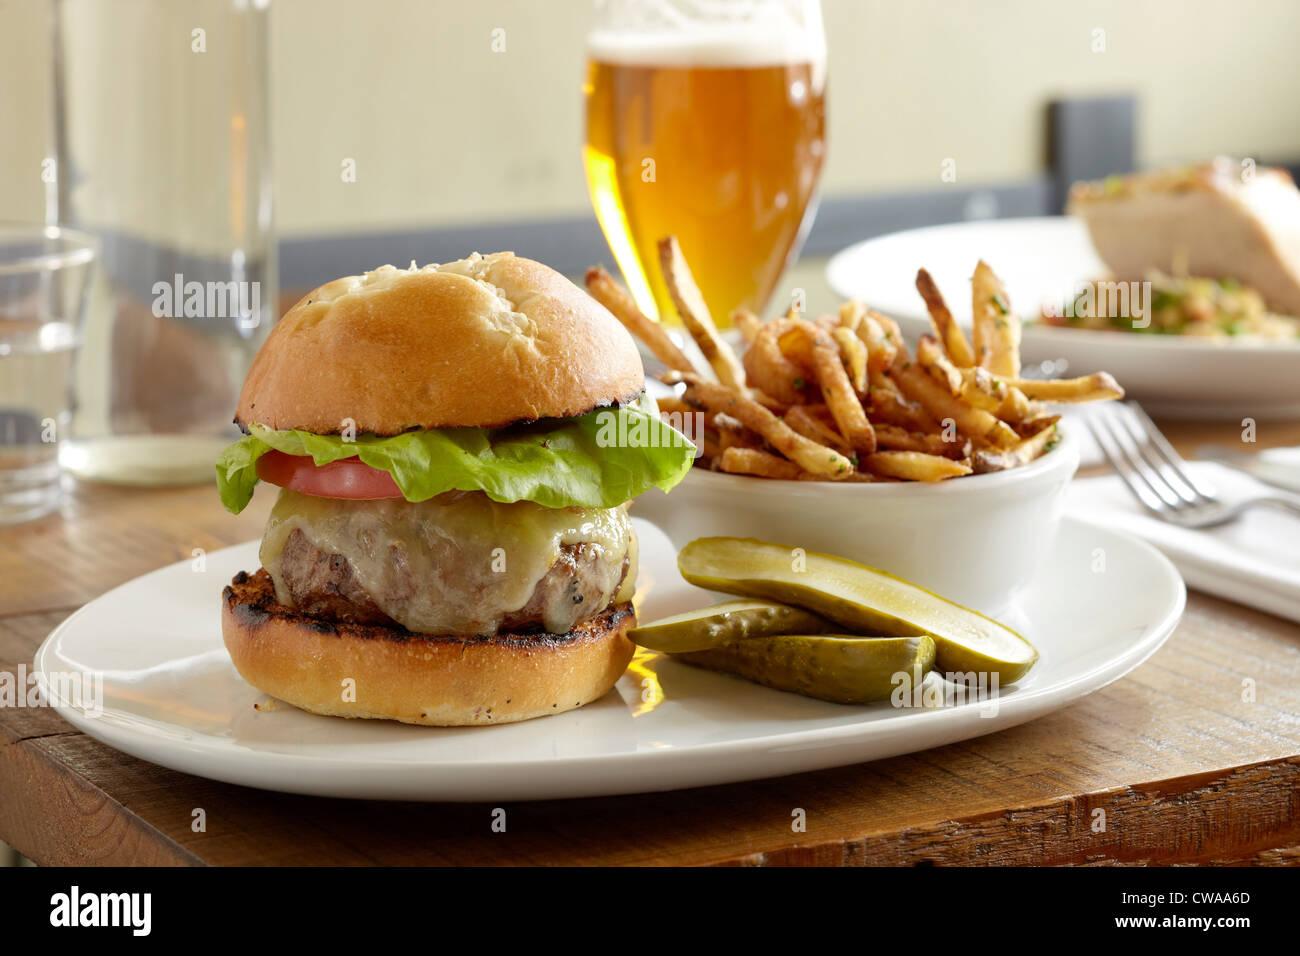 Burger und Pommes frites Stockfoto